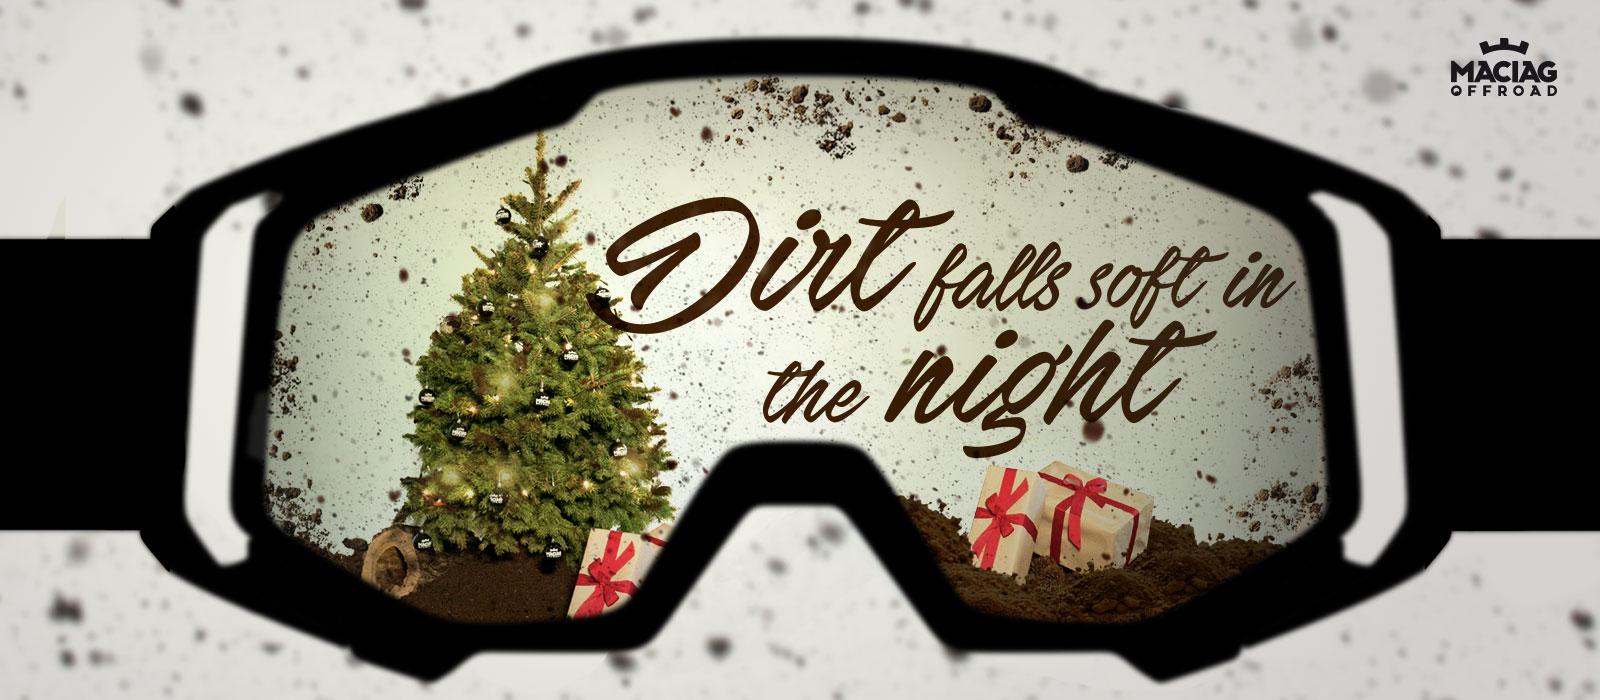 Christmas 2017 Motocross & Mountain bike Dirt falls soft in the night Wallpaper